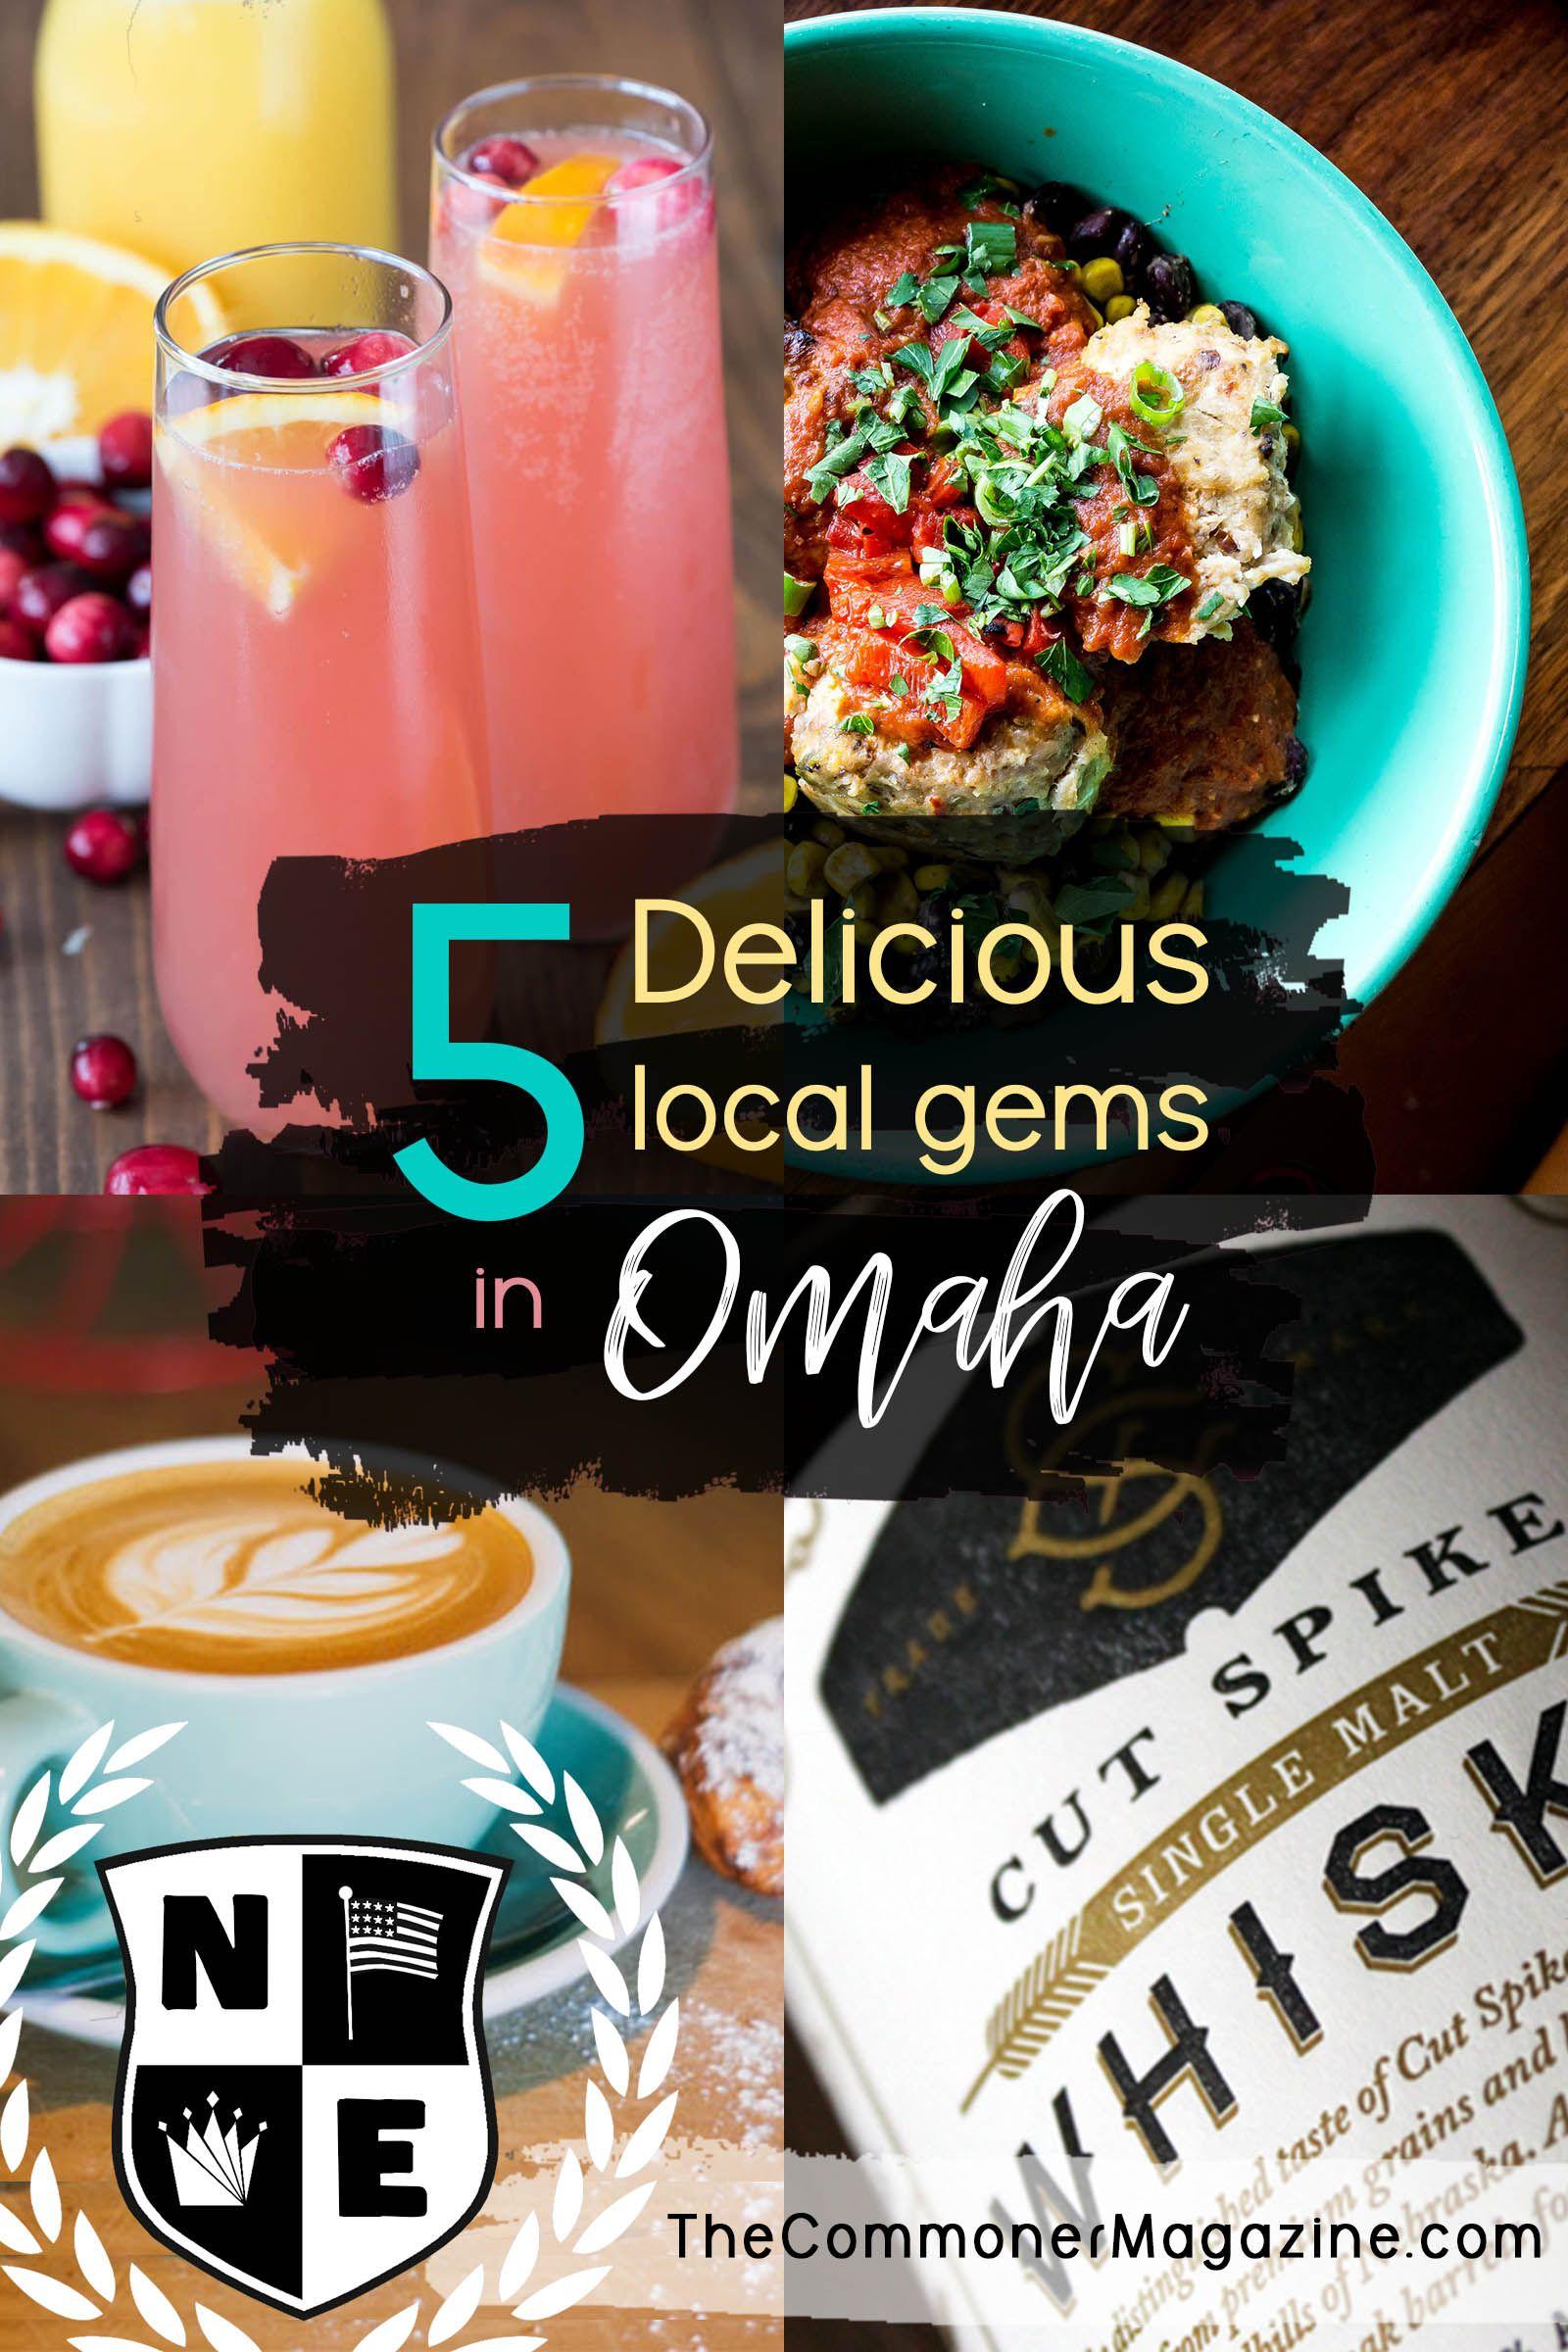 Our needtoknow favorite spots travel nebraska omaha